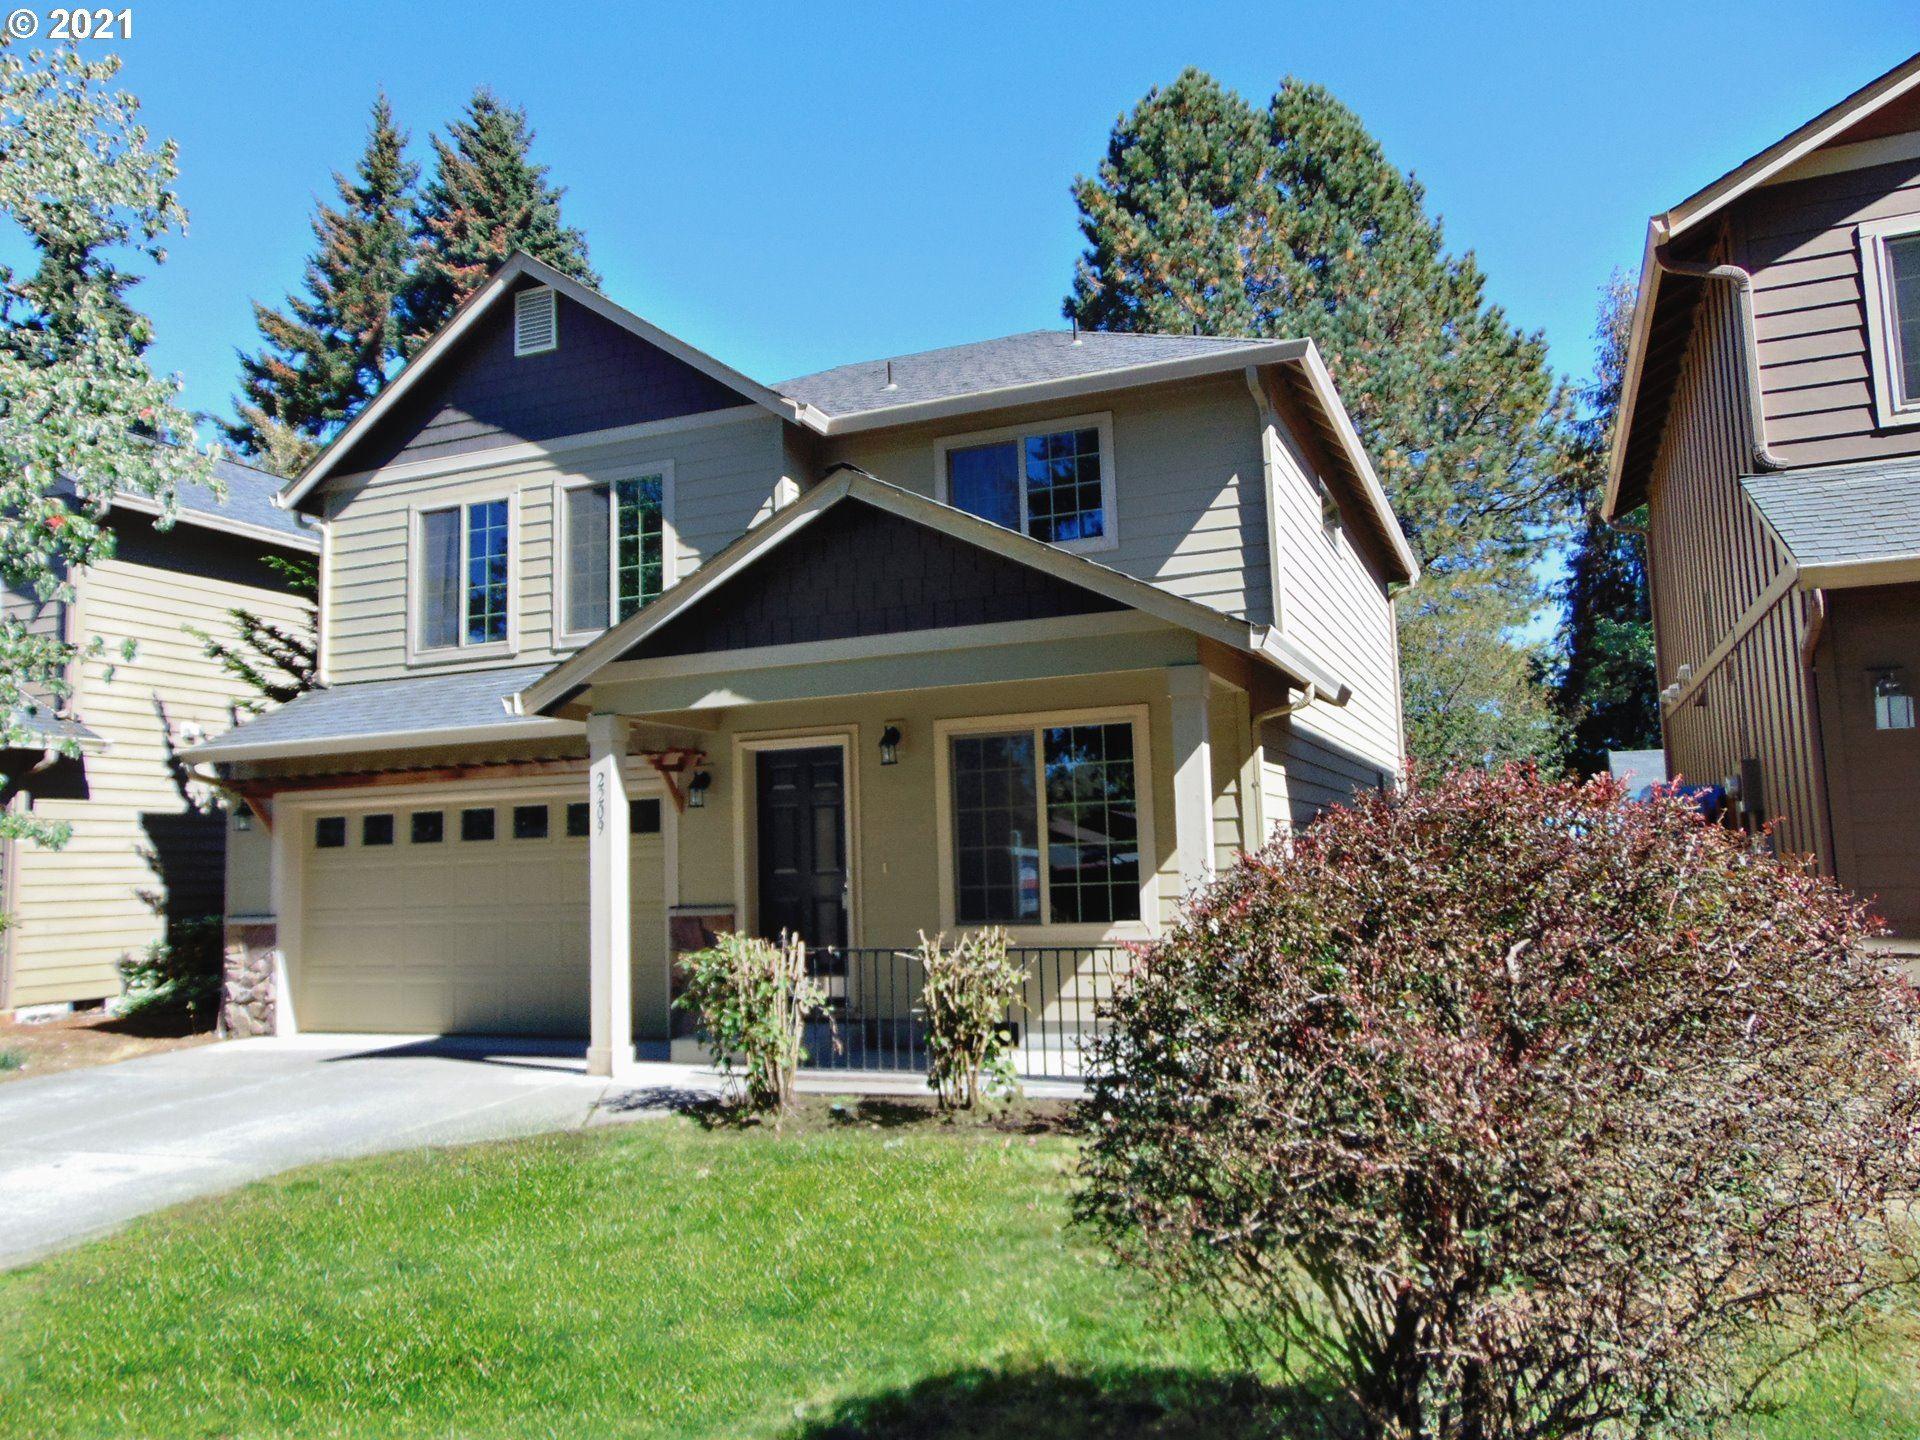 2209 NE 94TH CT, Vancouver, WA 98664 - MLS#: 21049192